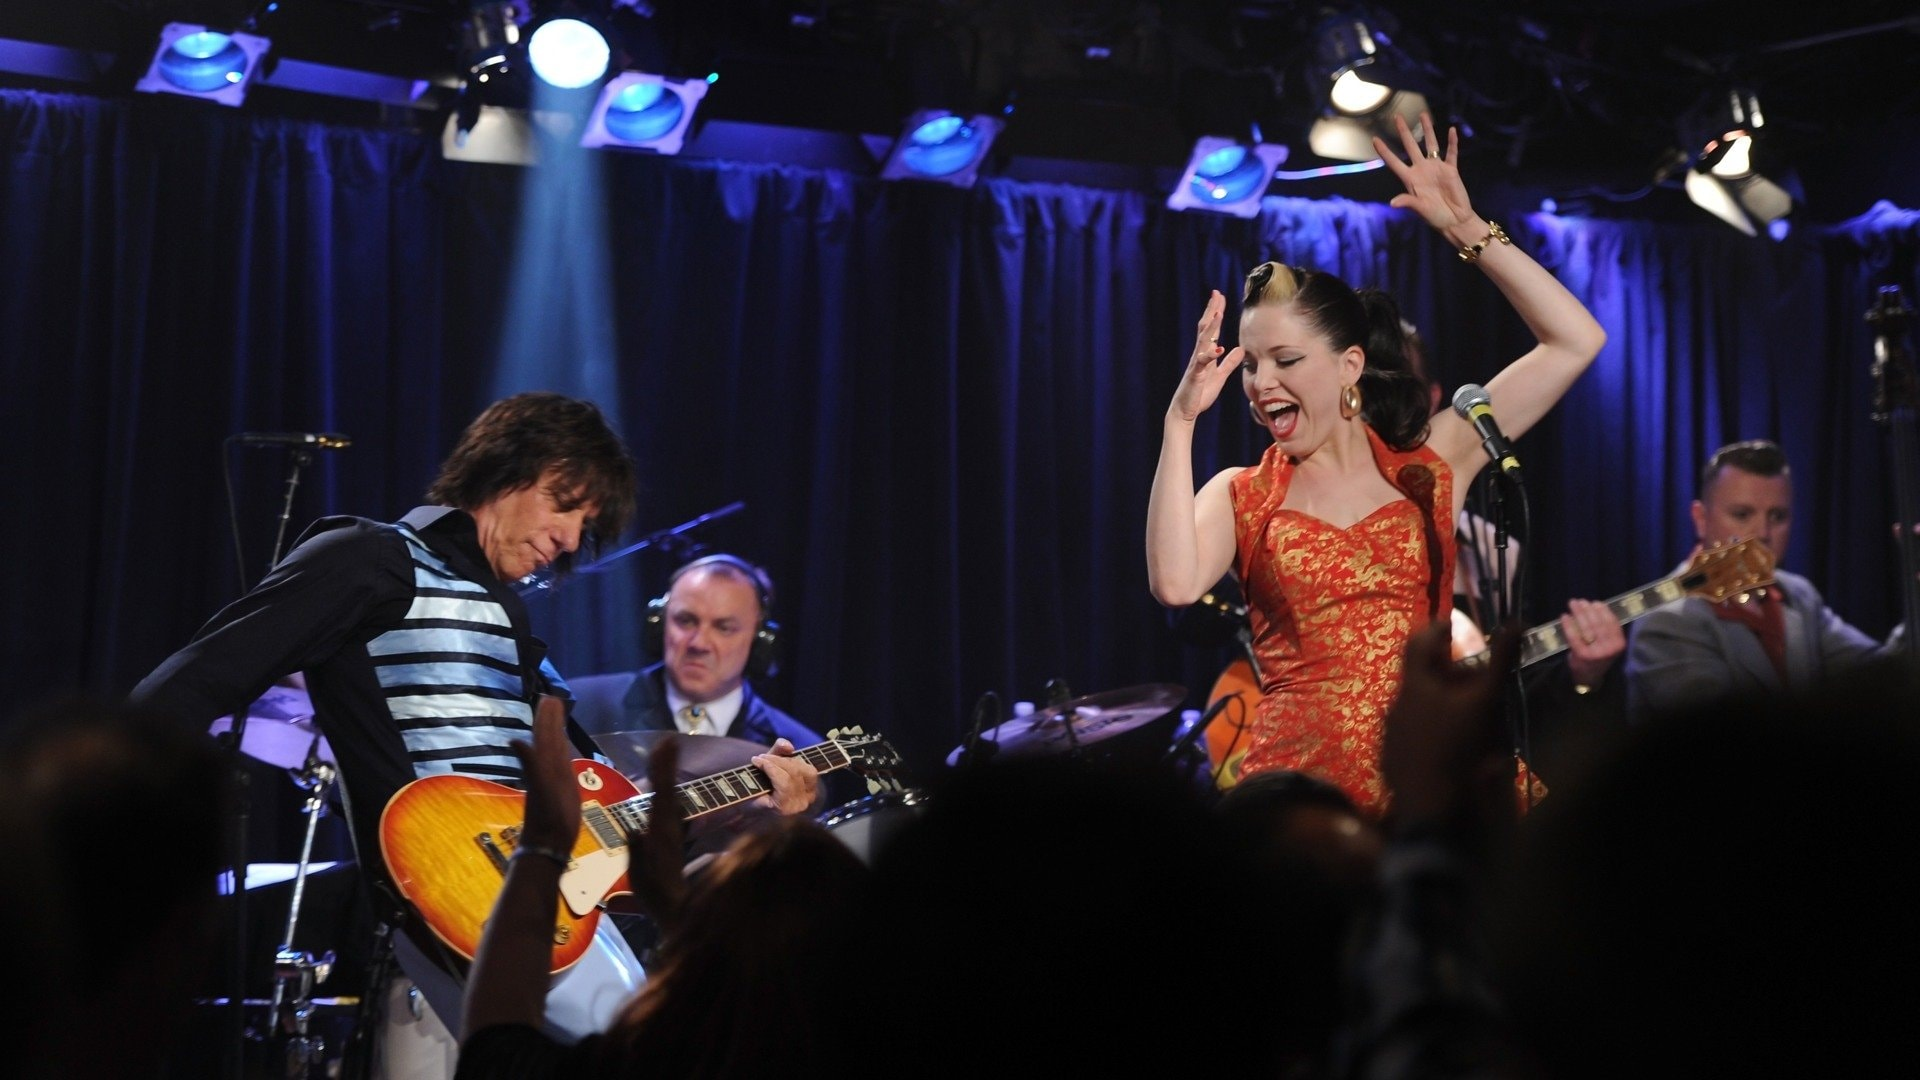 Jeff Beck: Rock 'n' Roll Party Honouring Les Paul